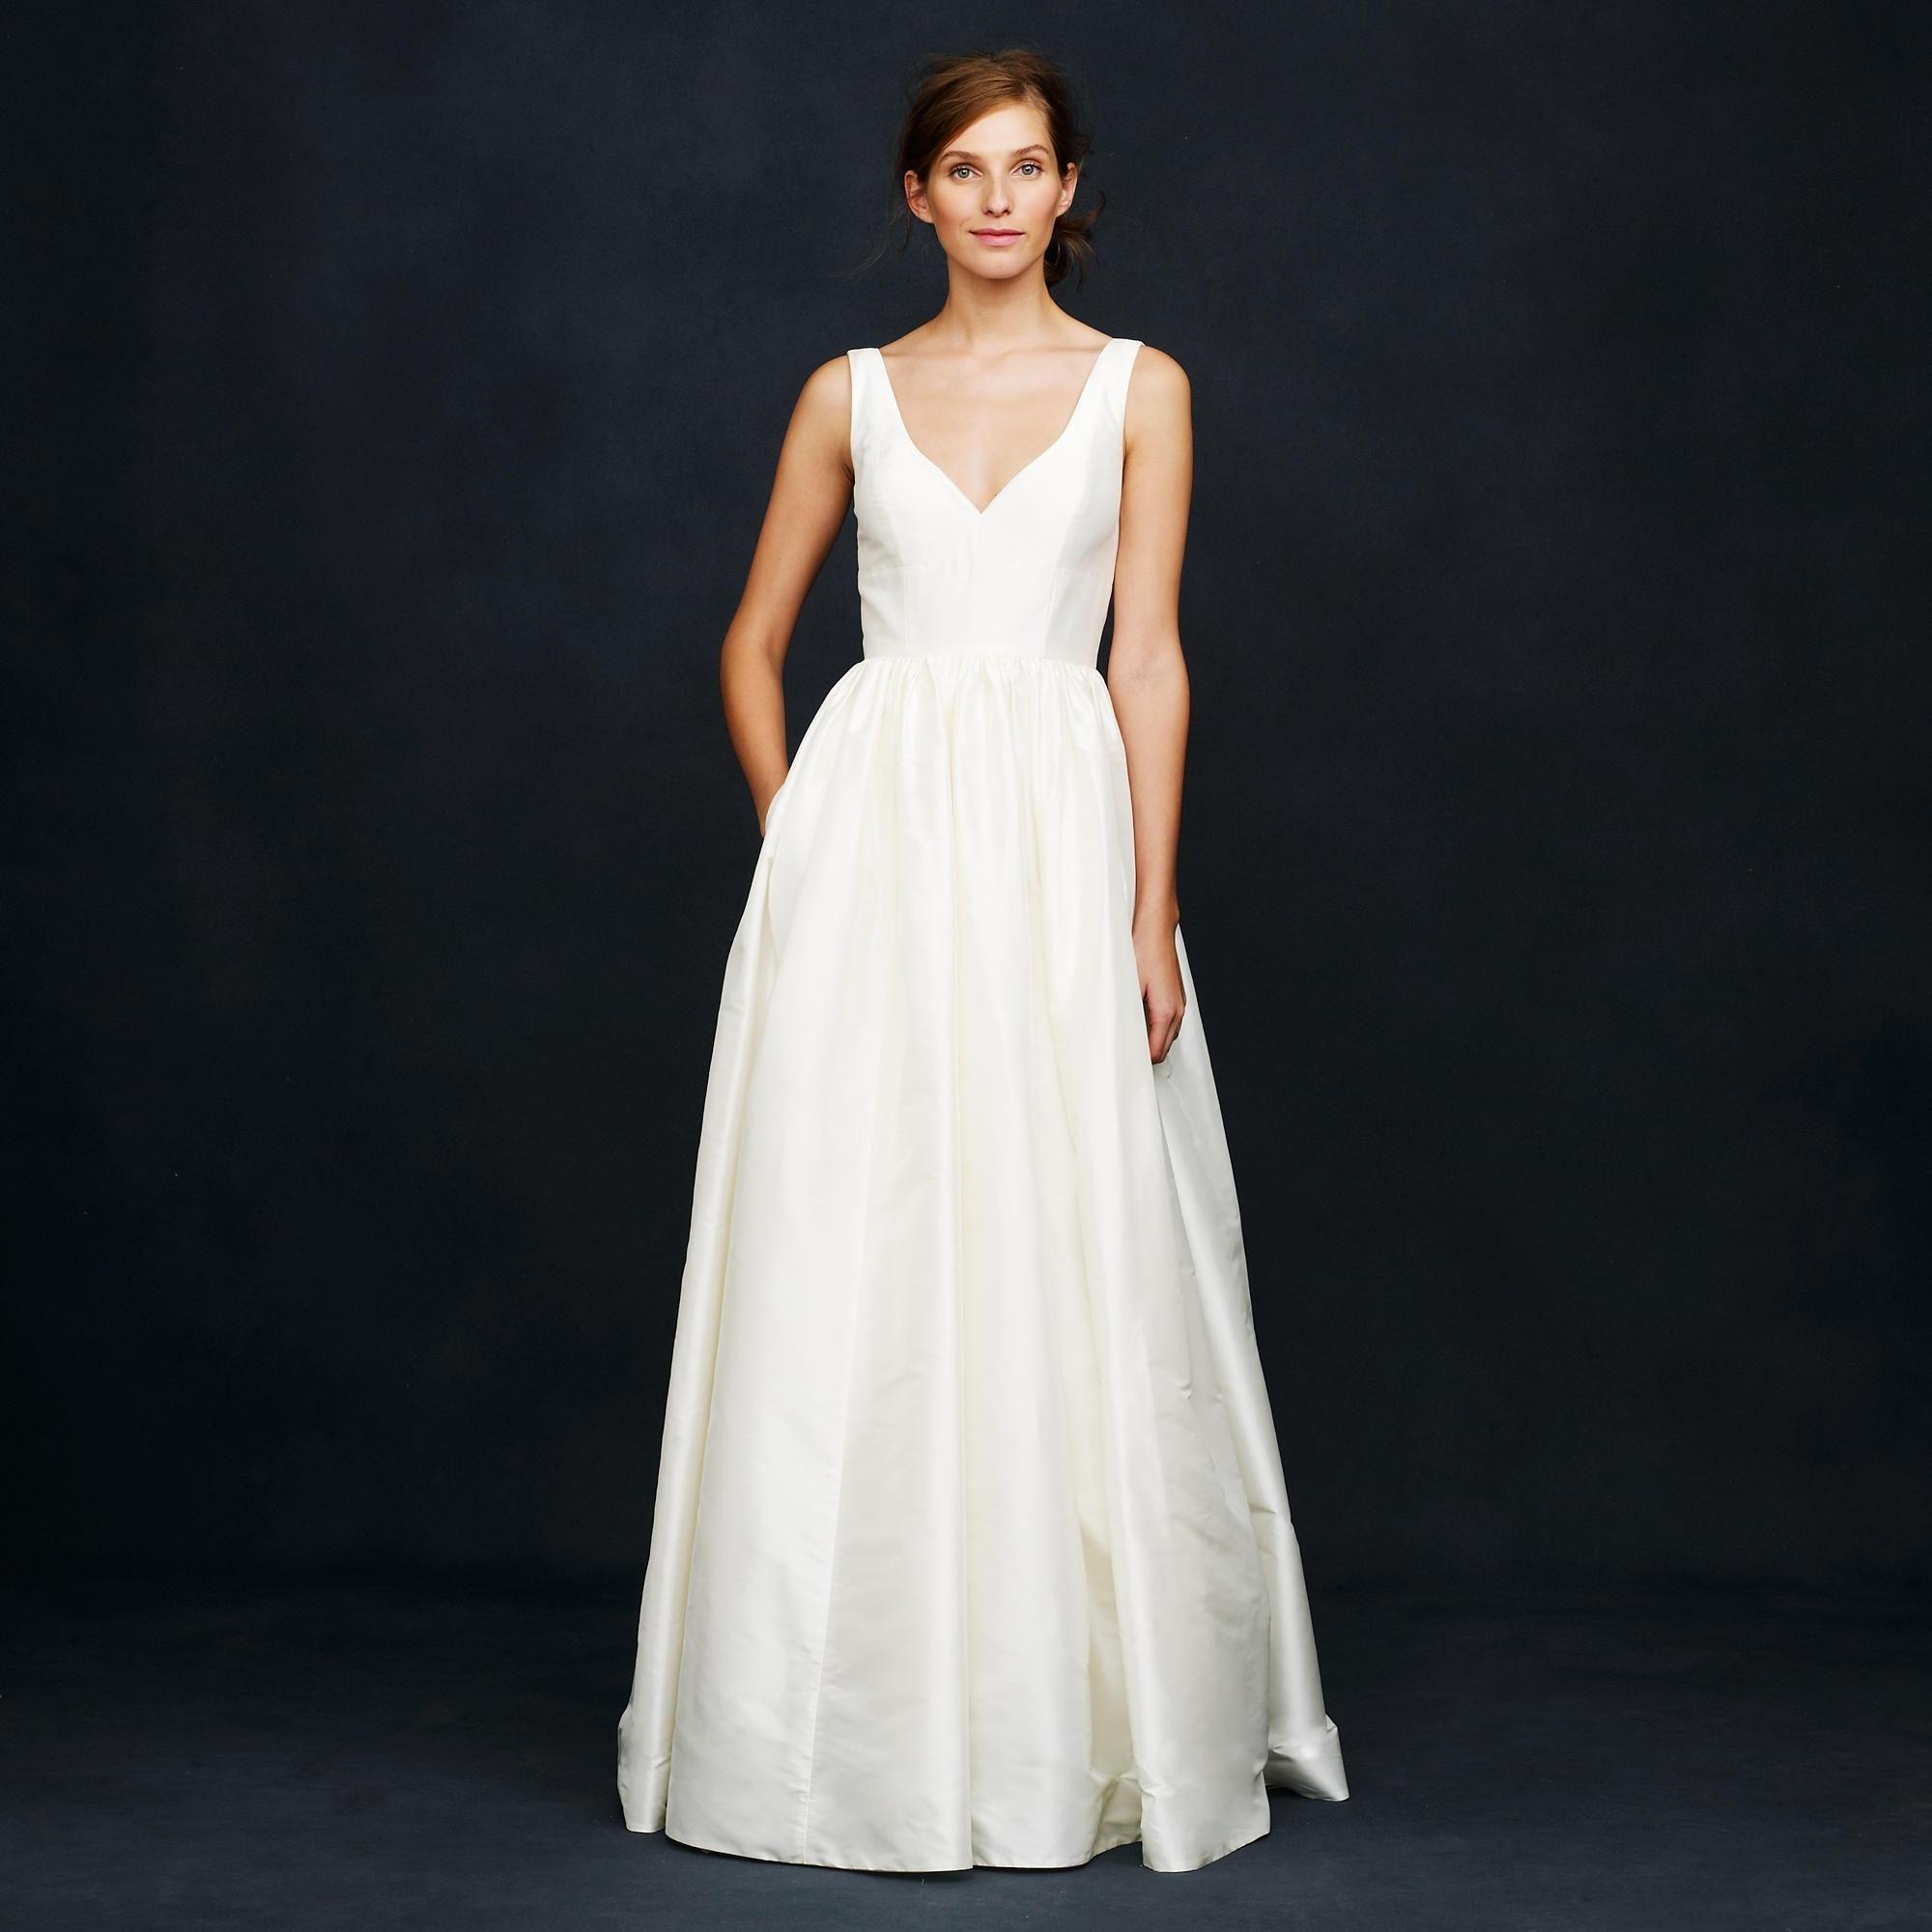 1320307d038 J.Crew Karlie Ball Gown Wedding Dress on Tradesy Weddings (formerly  Recycled Bride)